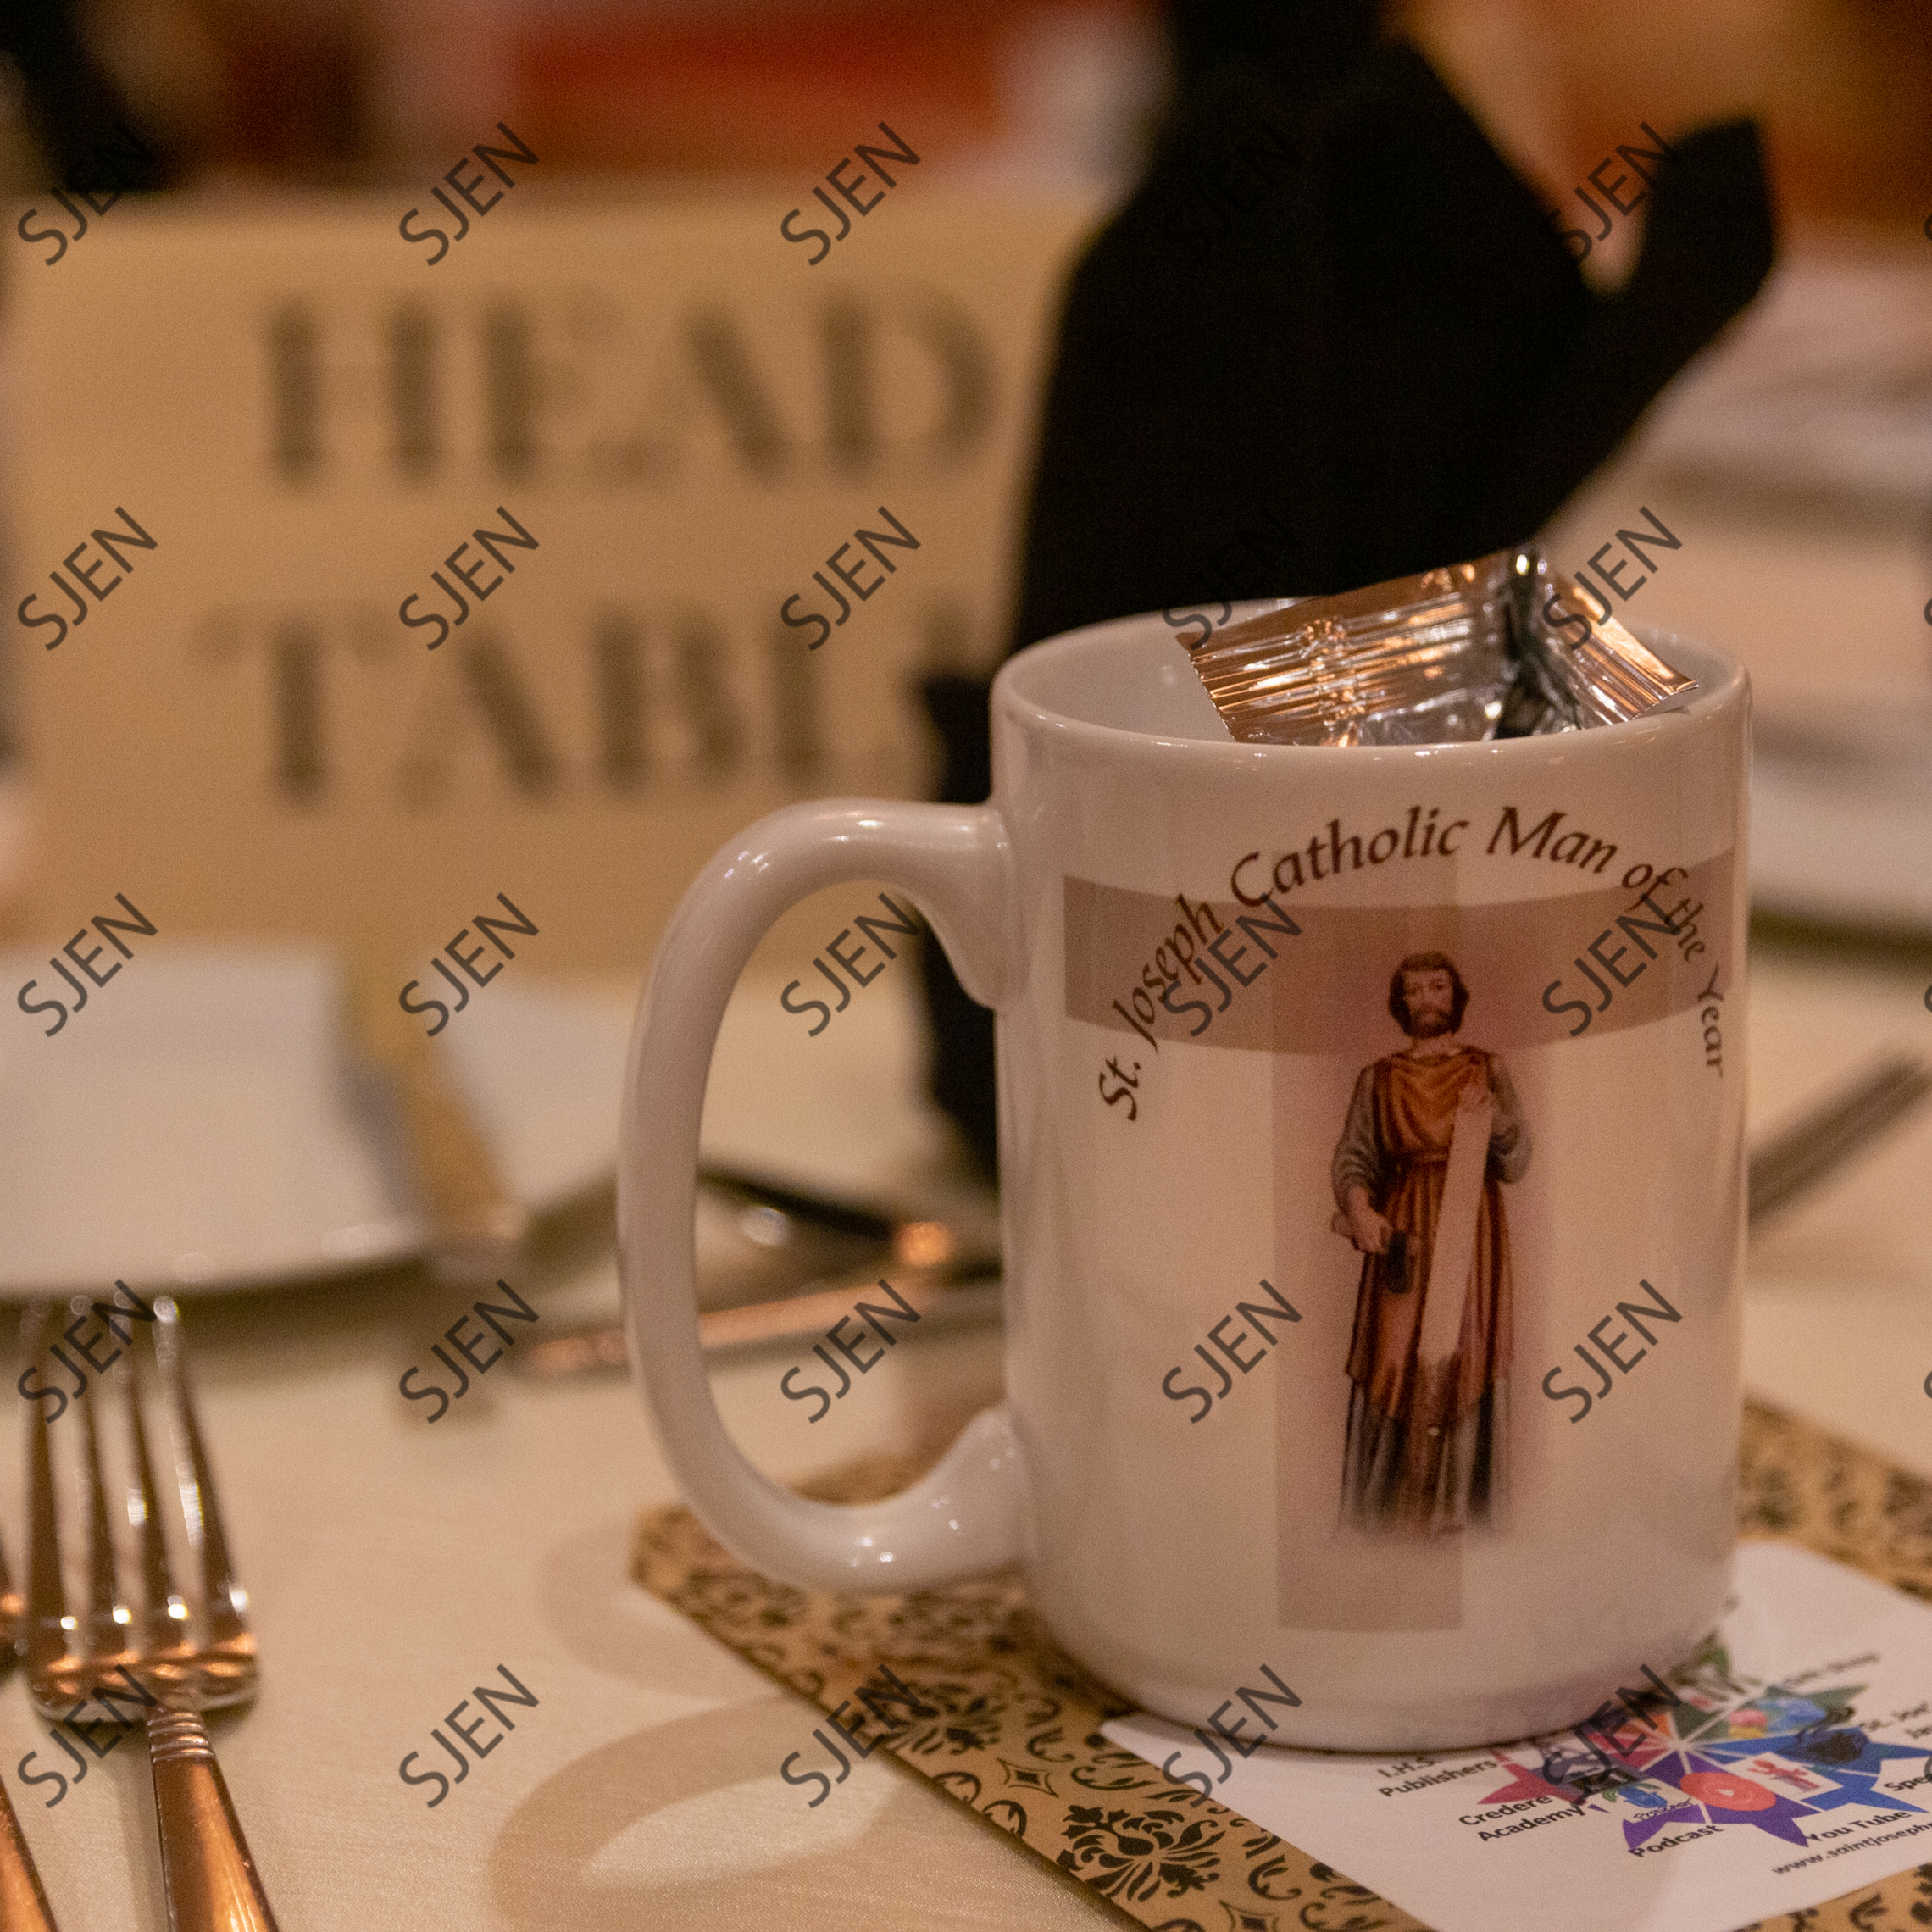 Catholic Man of the Year Head Table